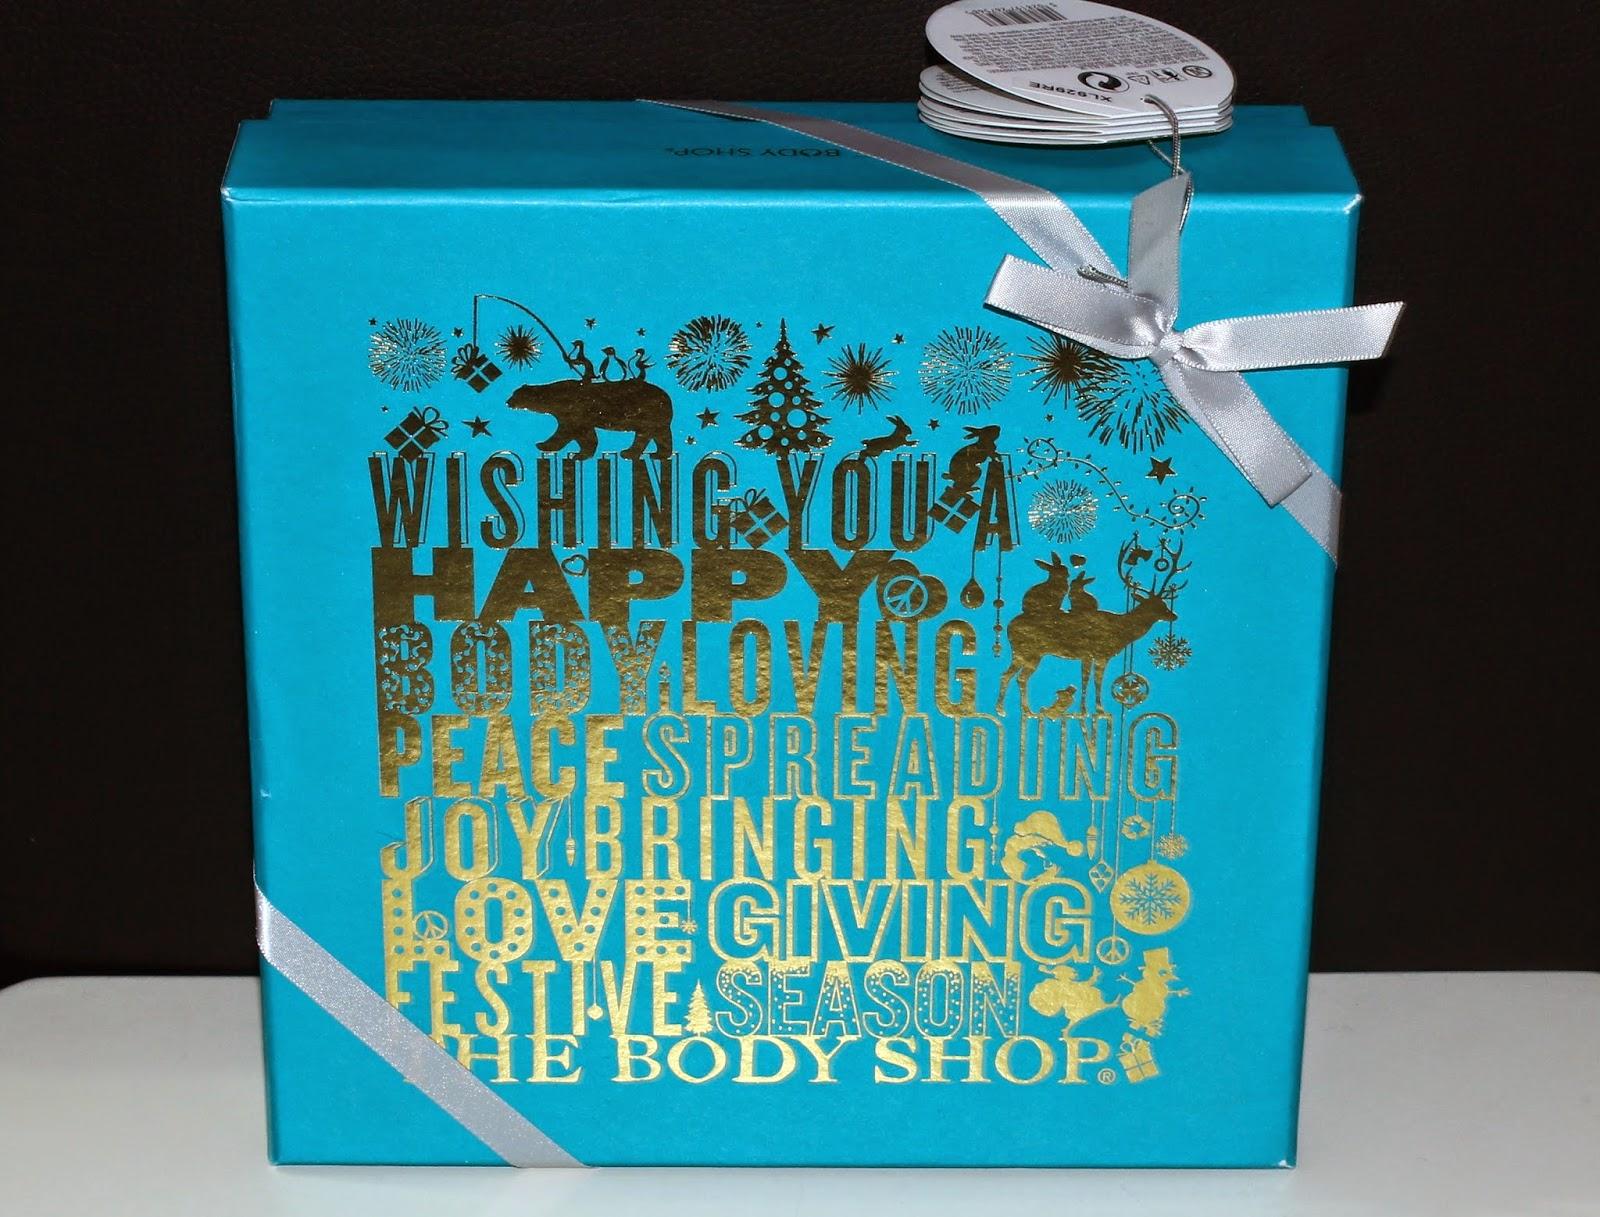 c2315a4a608 Xmas Gift Idea   Body Shop Bath & Body Christmas Gift Sets   Review